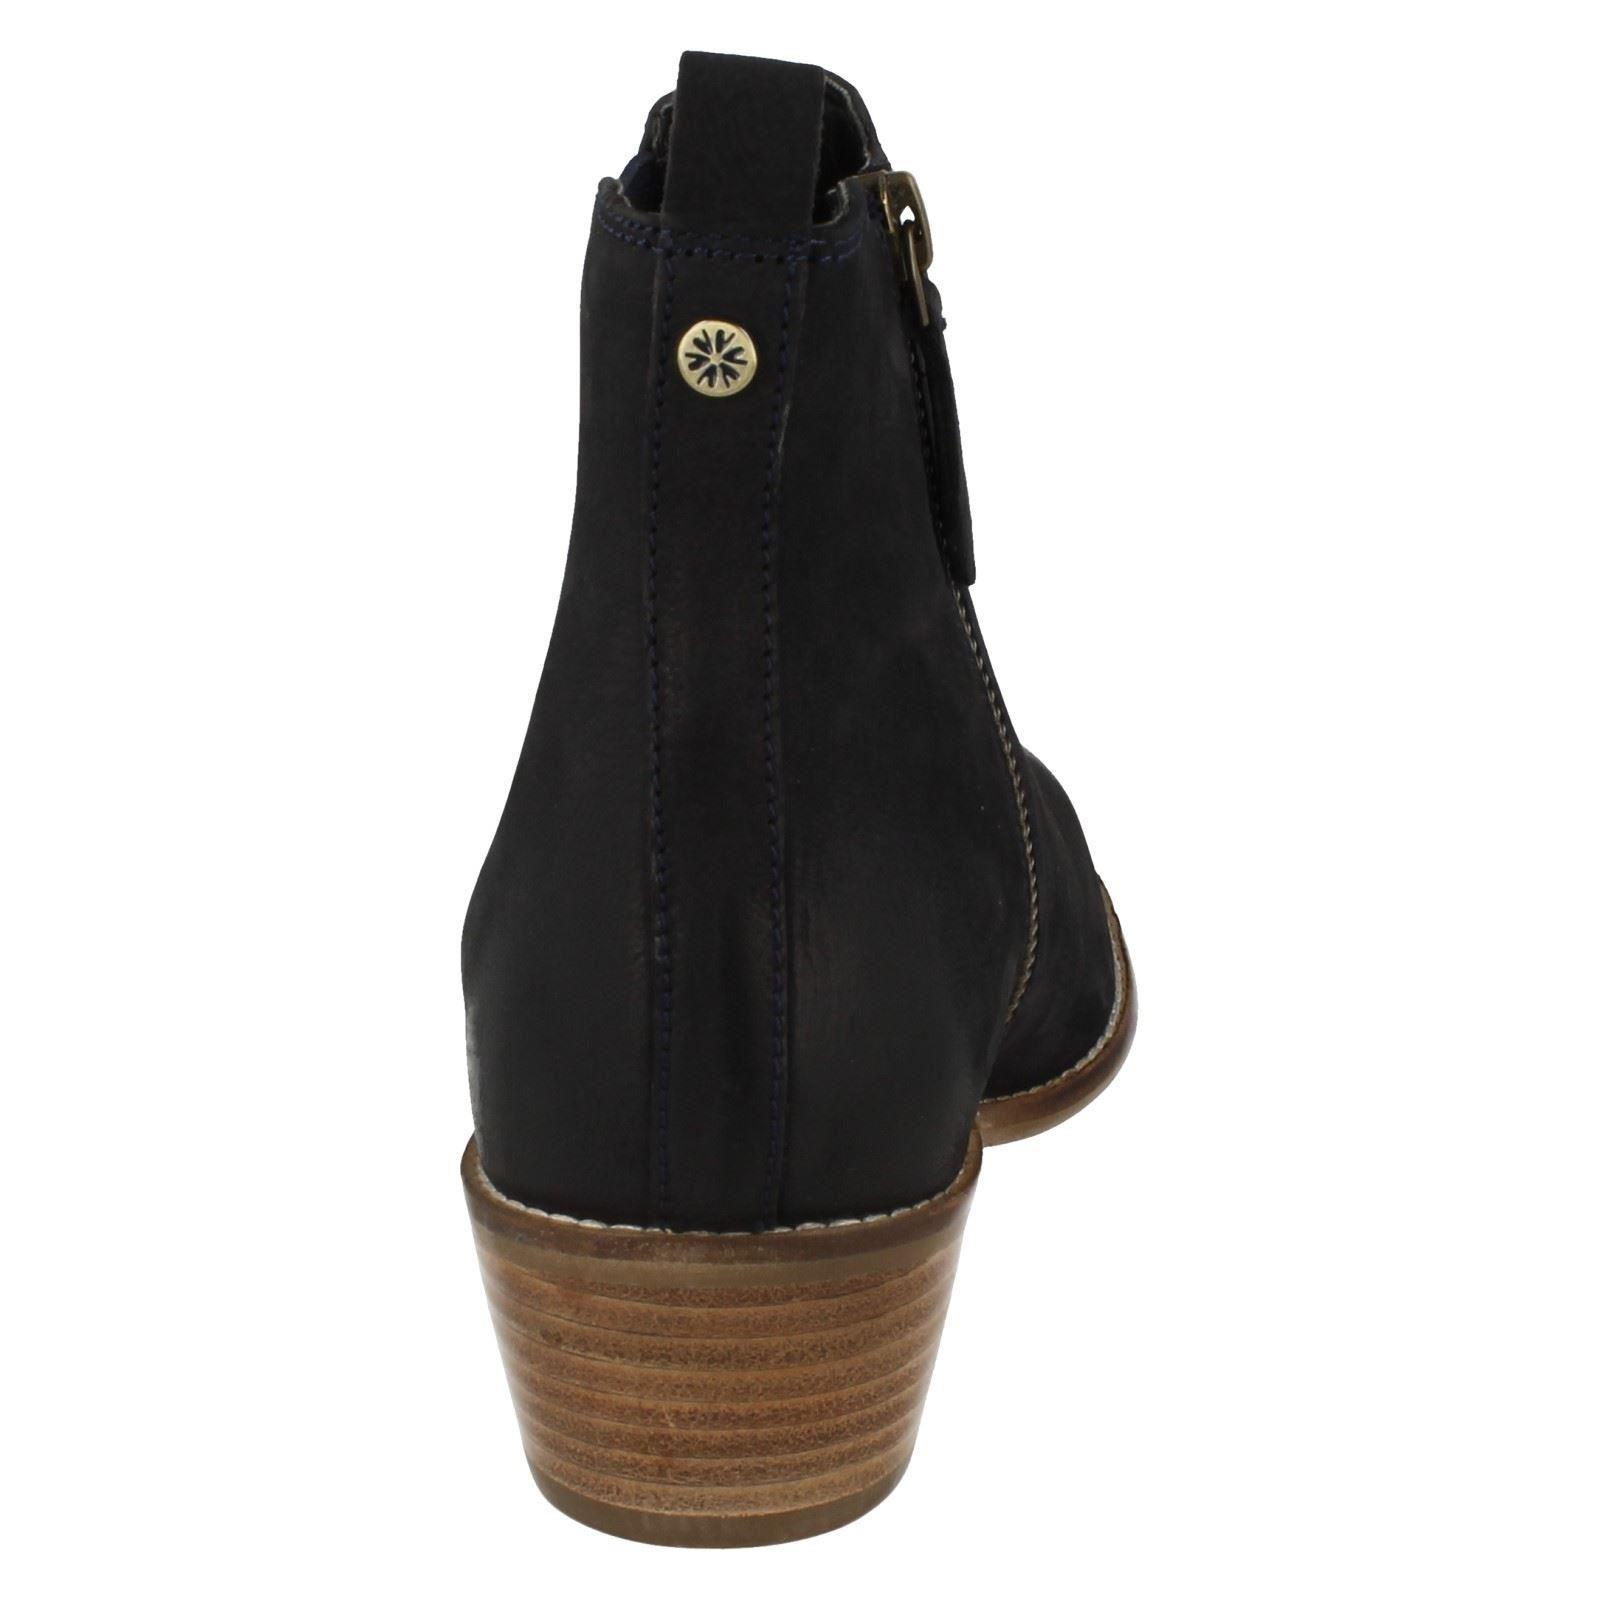 Ladies Van Dal Zip Up Nubuck Leather Chelsea Ankle Boots Benton